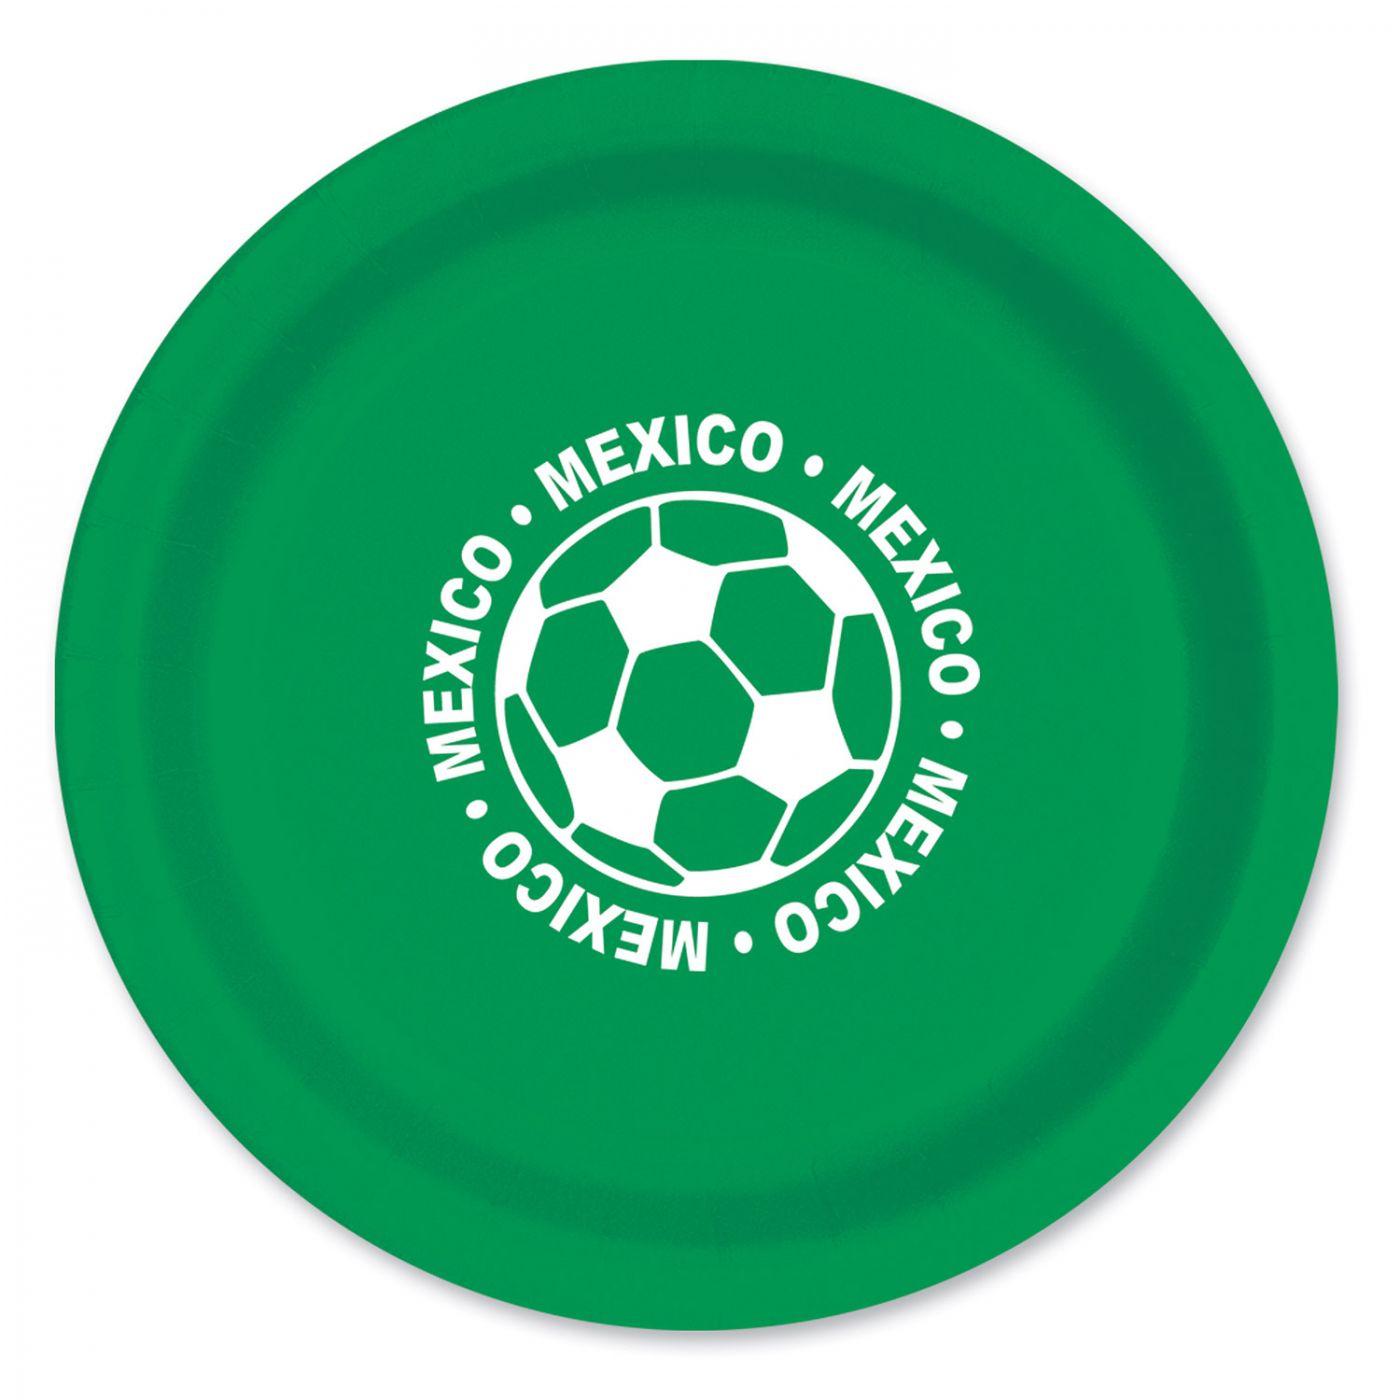 Plates - Mexico image